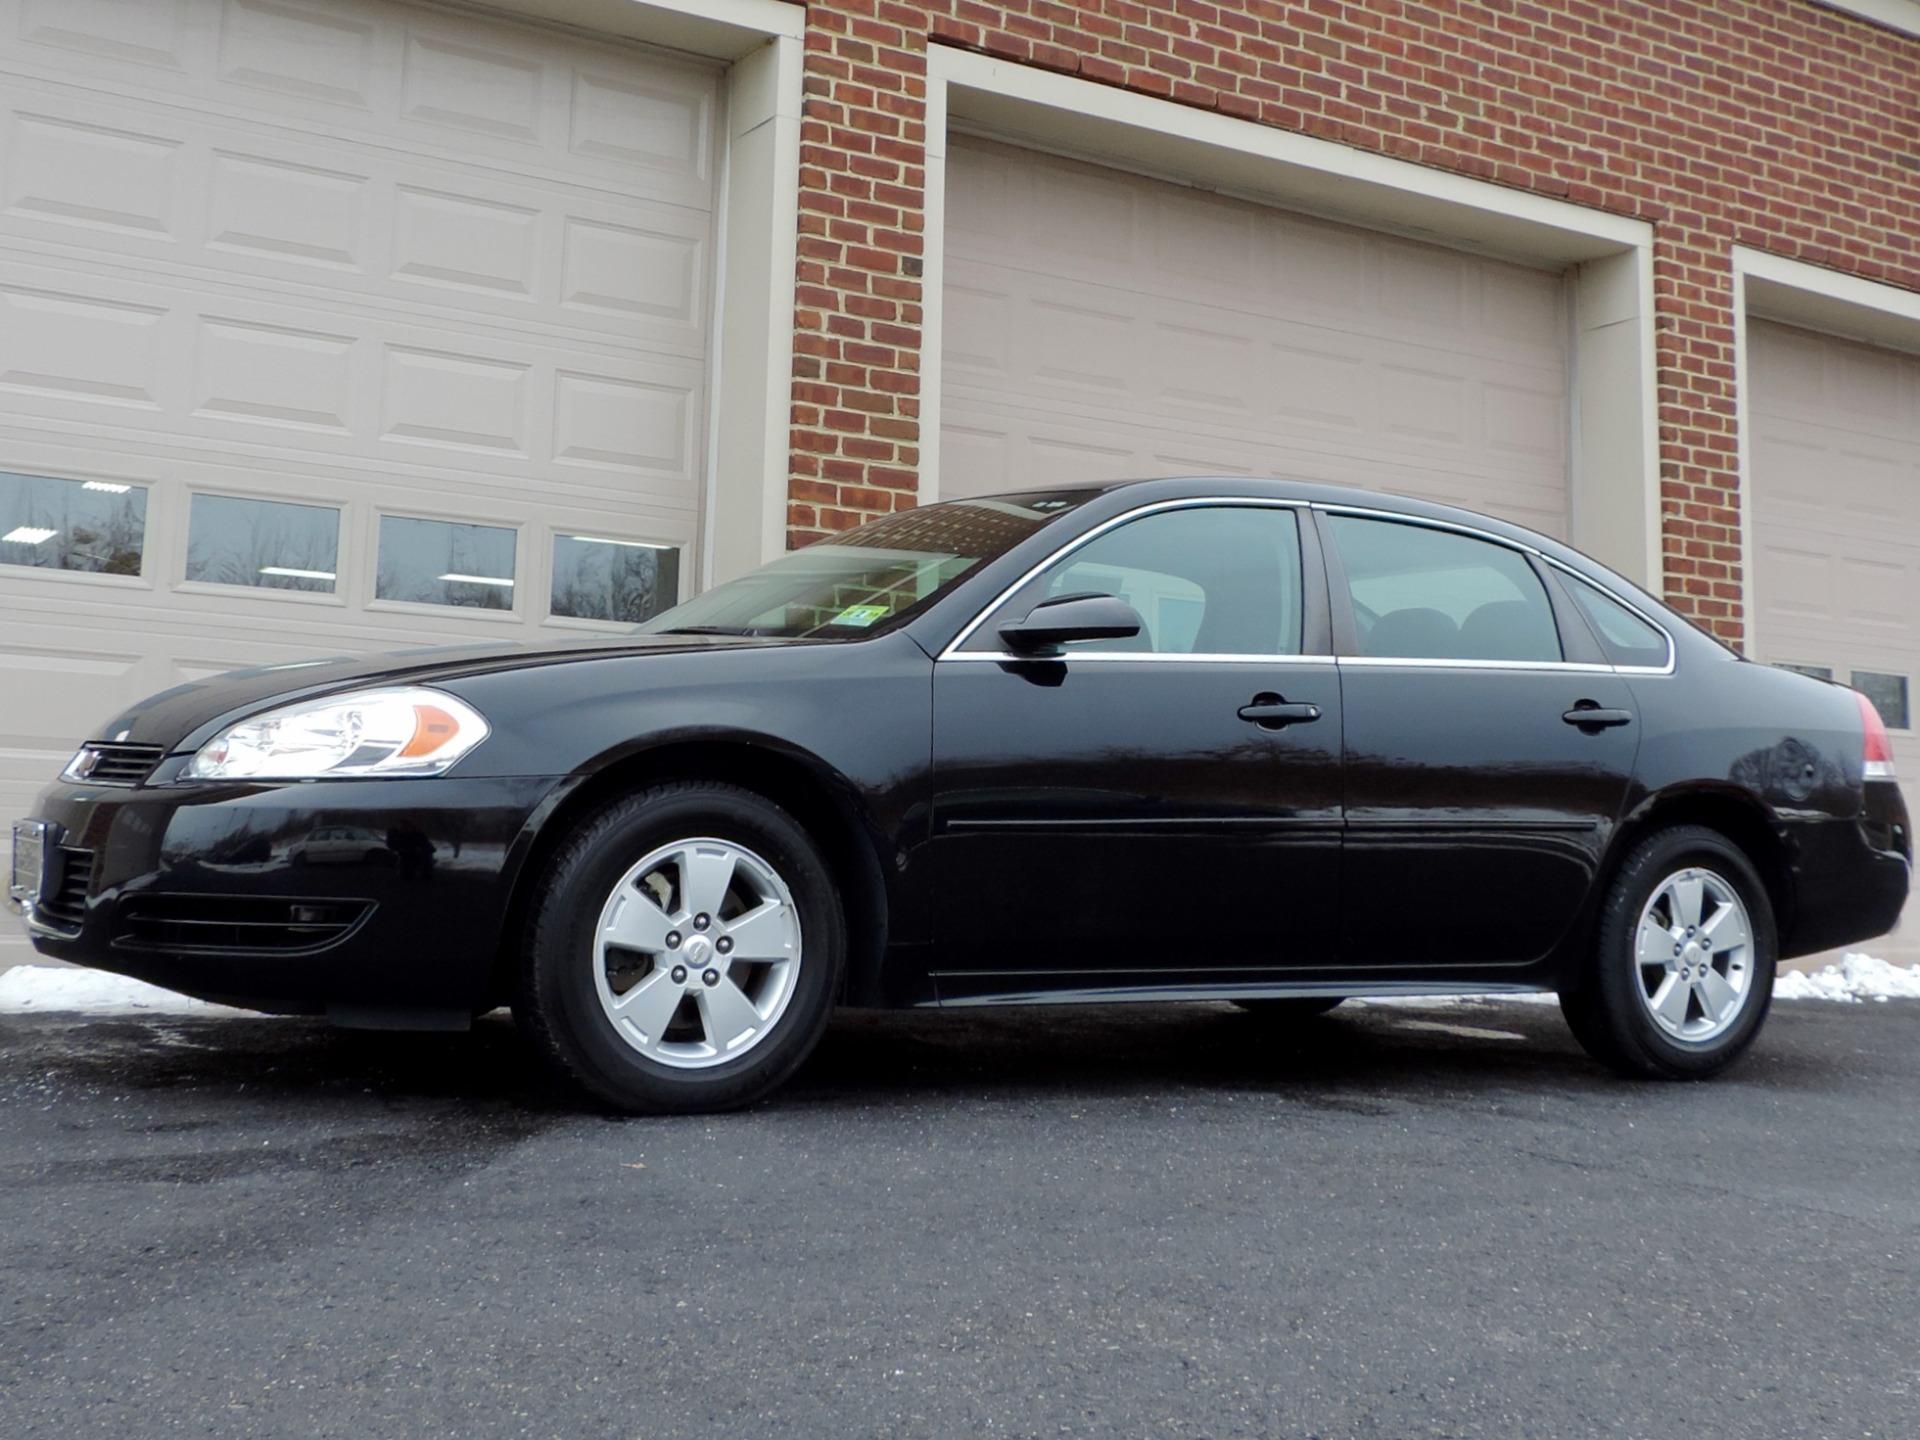 2011 Chevrolet Impala LS Fleet Stock # 314925 for sale ... | 1920 x 1440 jpeg 511kB